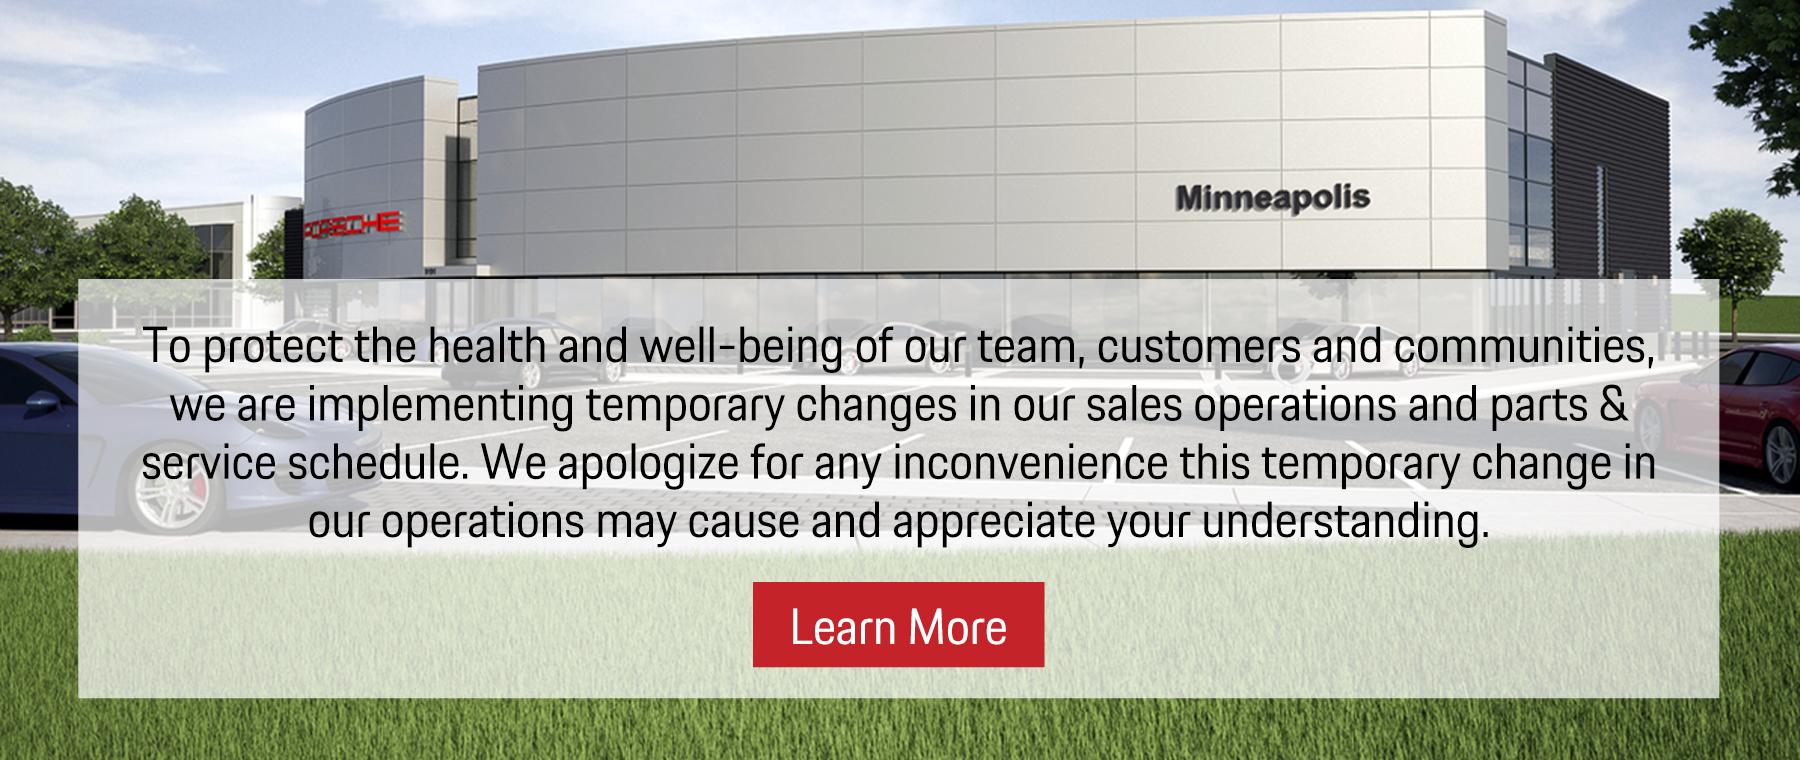 Porsche Minneapolis COVID-19 Response